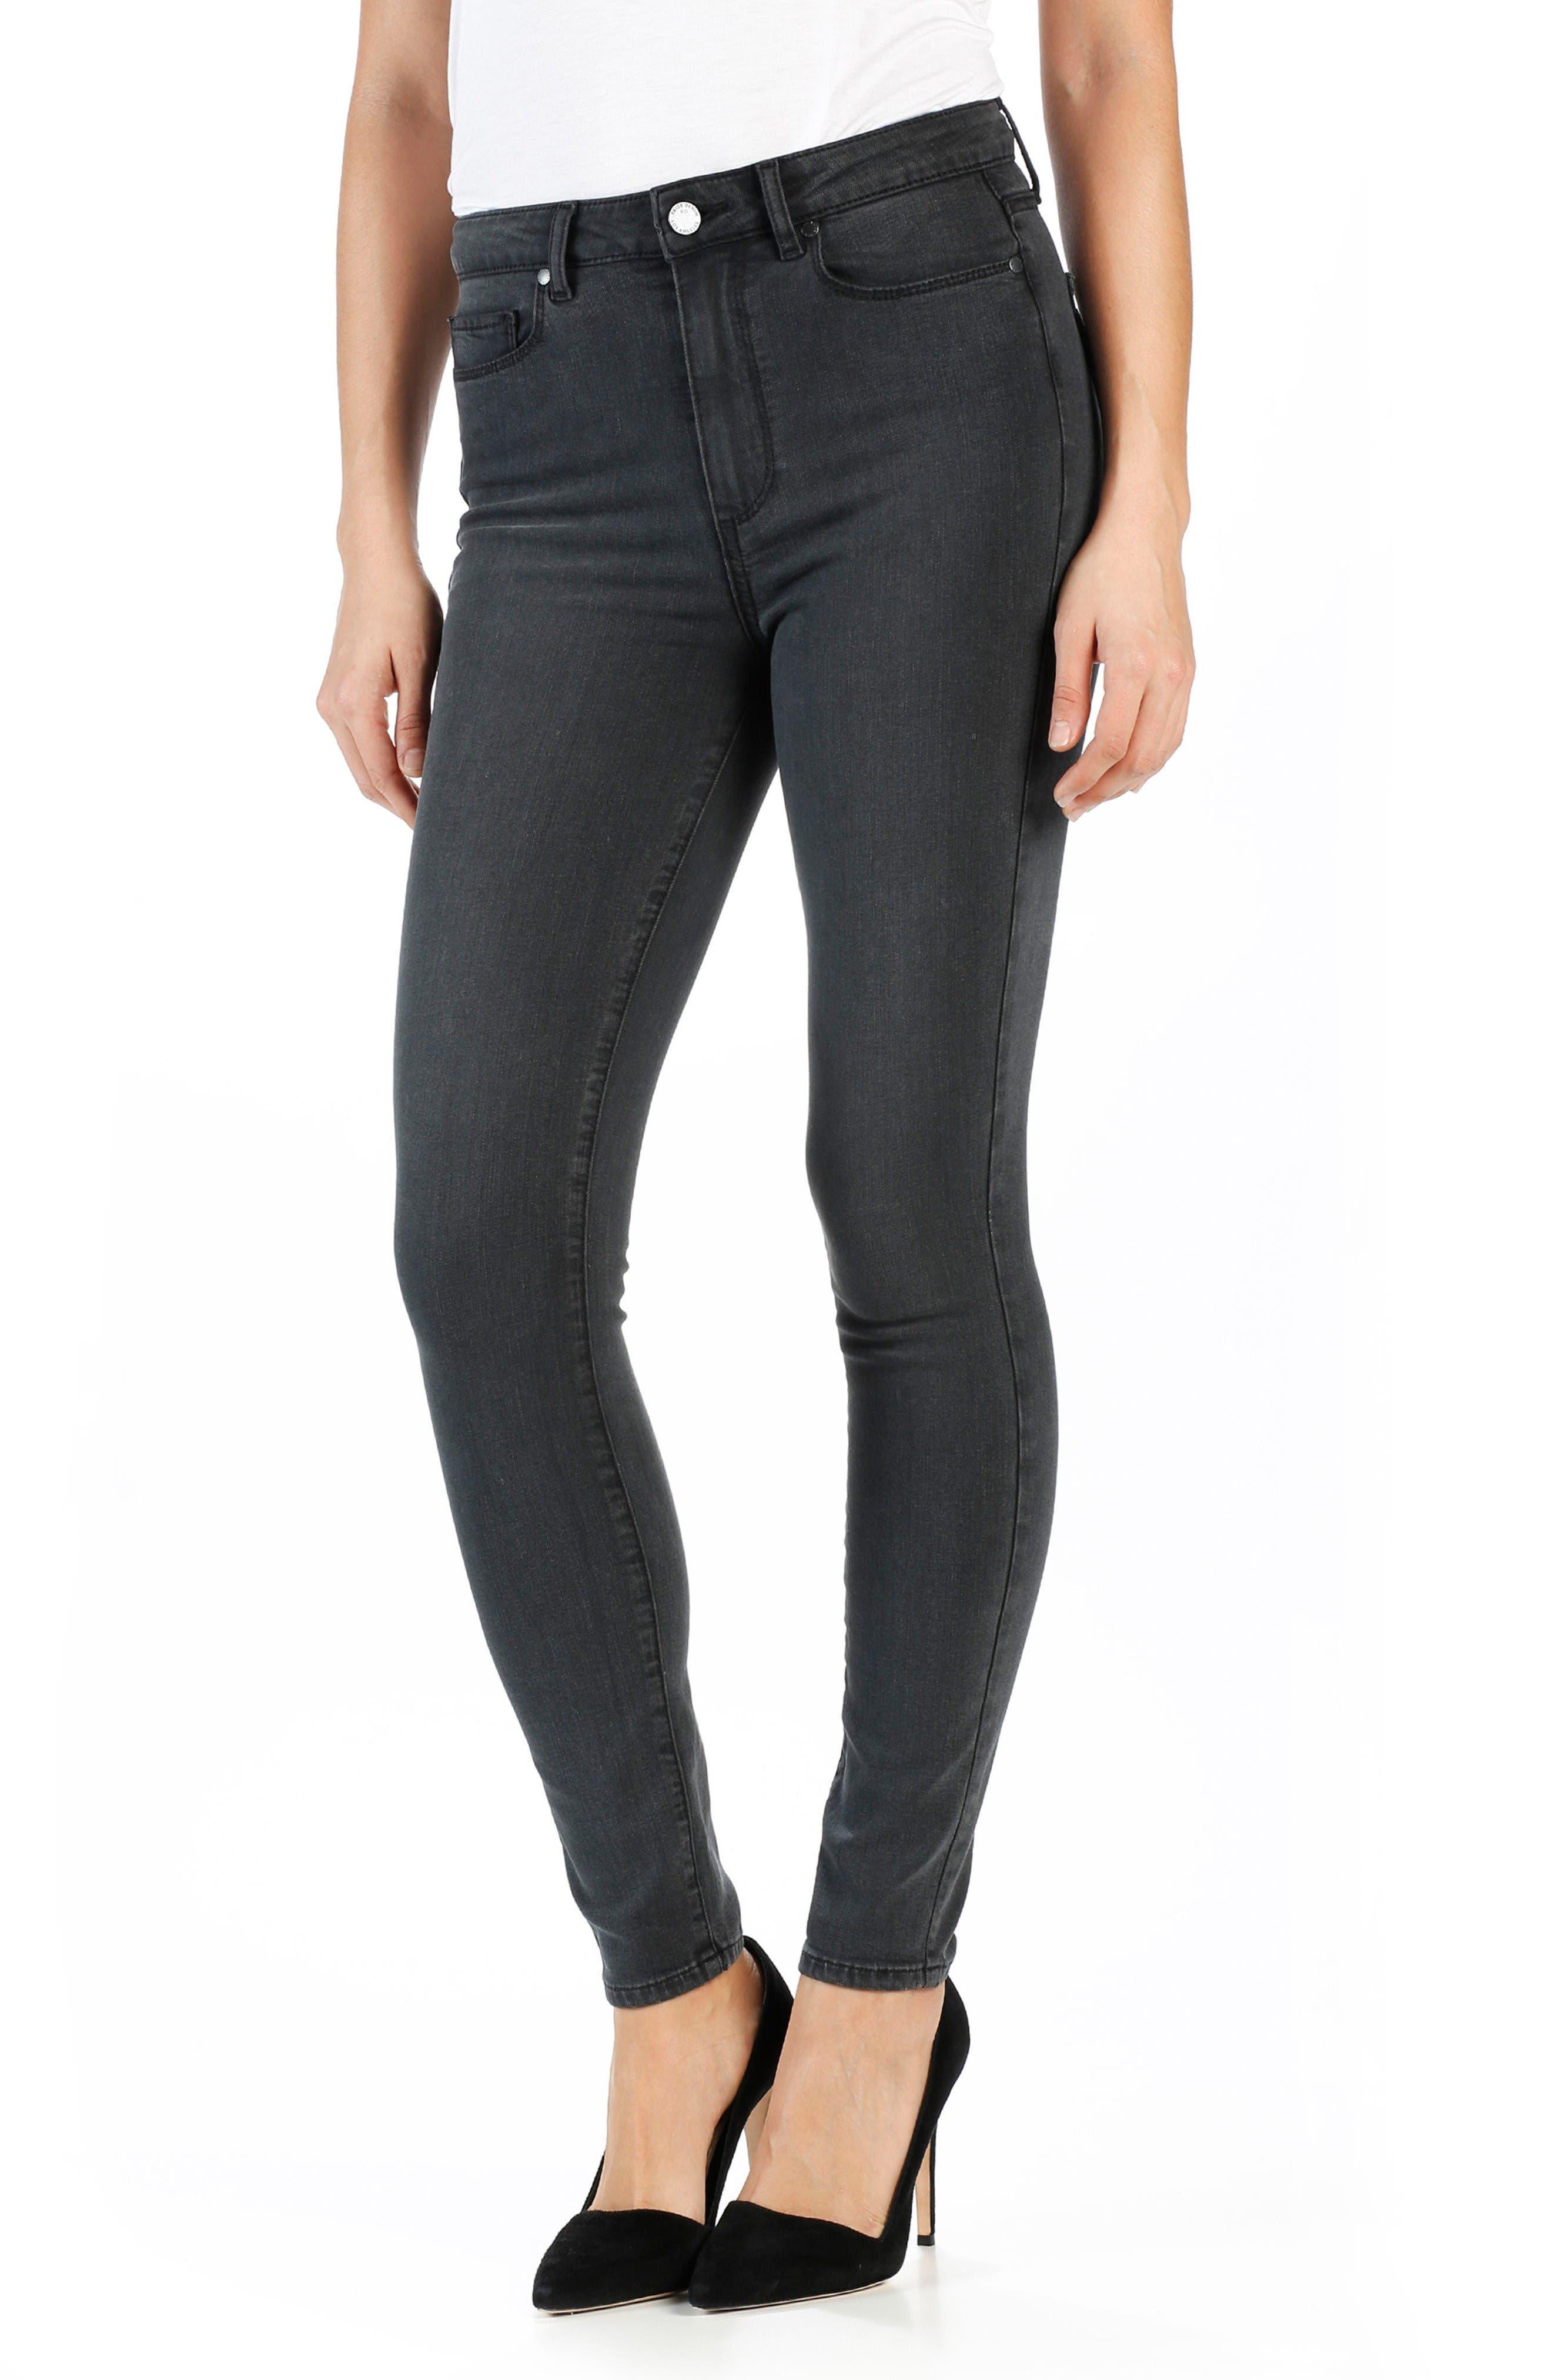 PAIGE Transcend - Margot High Rise Ultra Skinny Jeans (Smoke Grey)